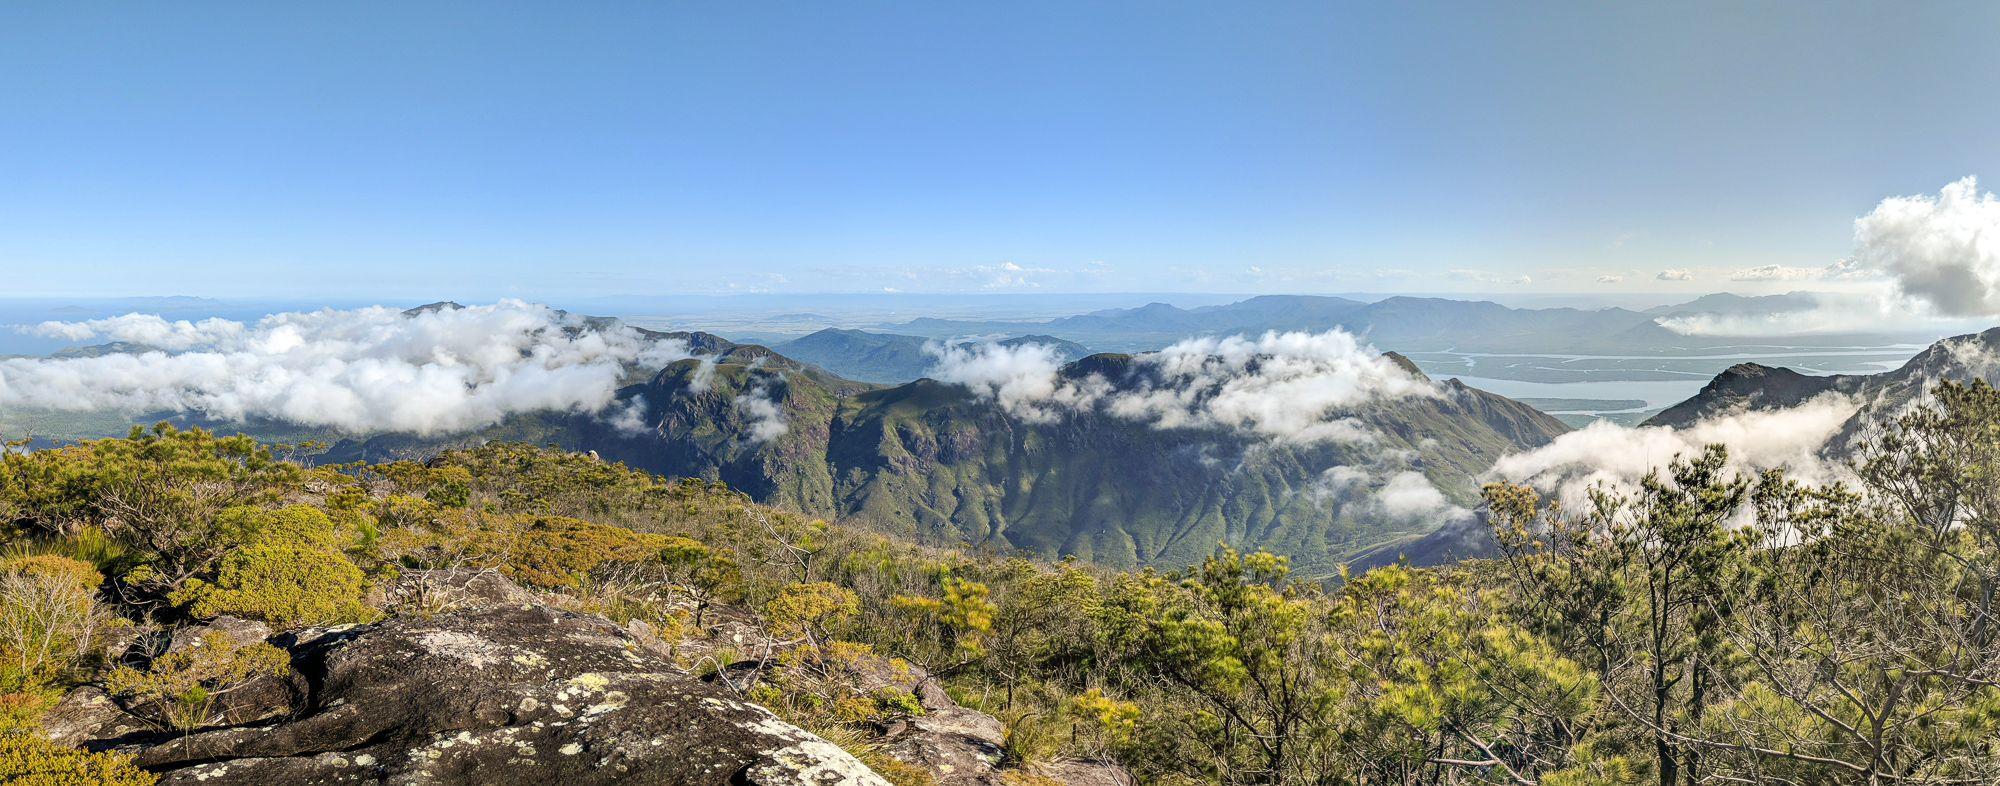 Views from Mount Bowen, Hinchinbrook Island